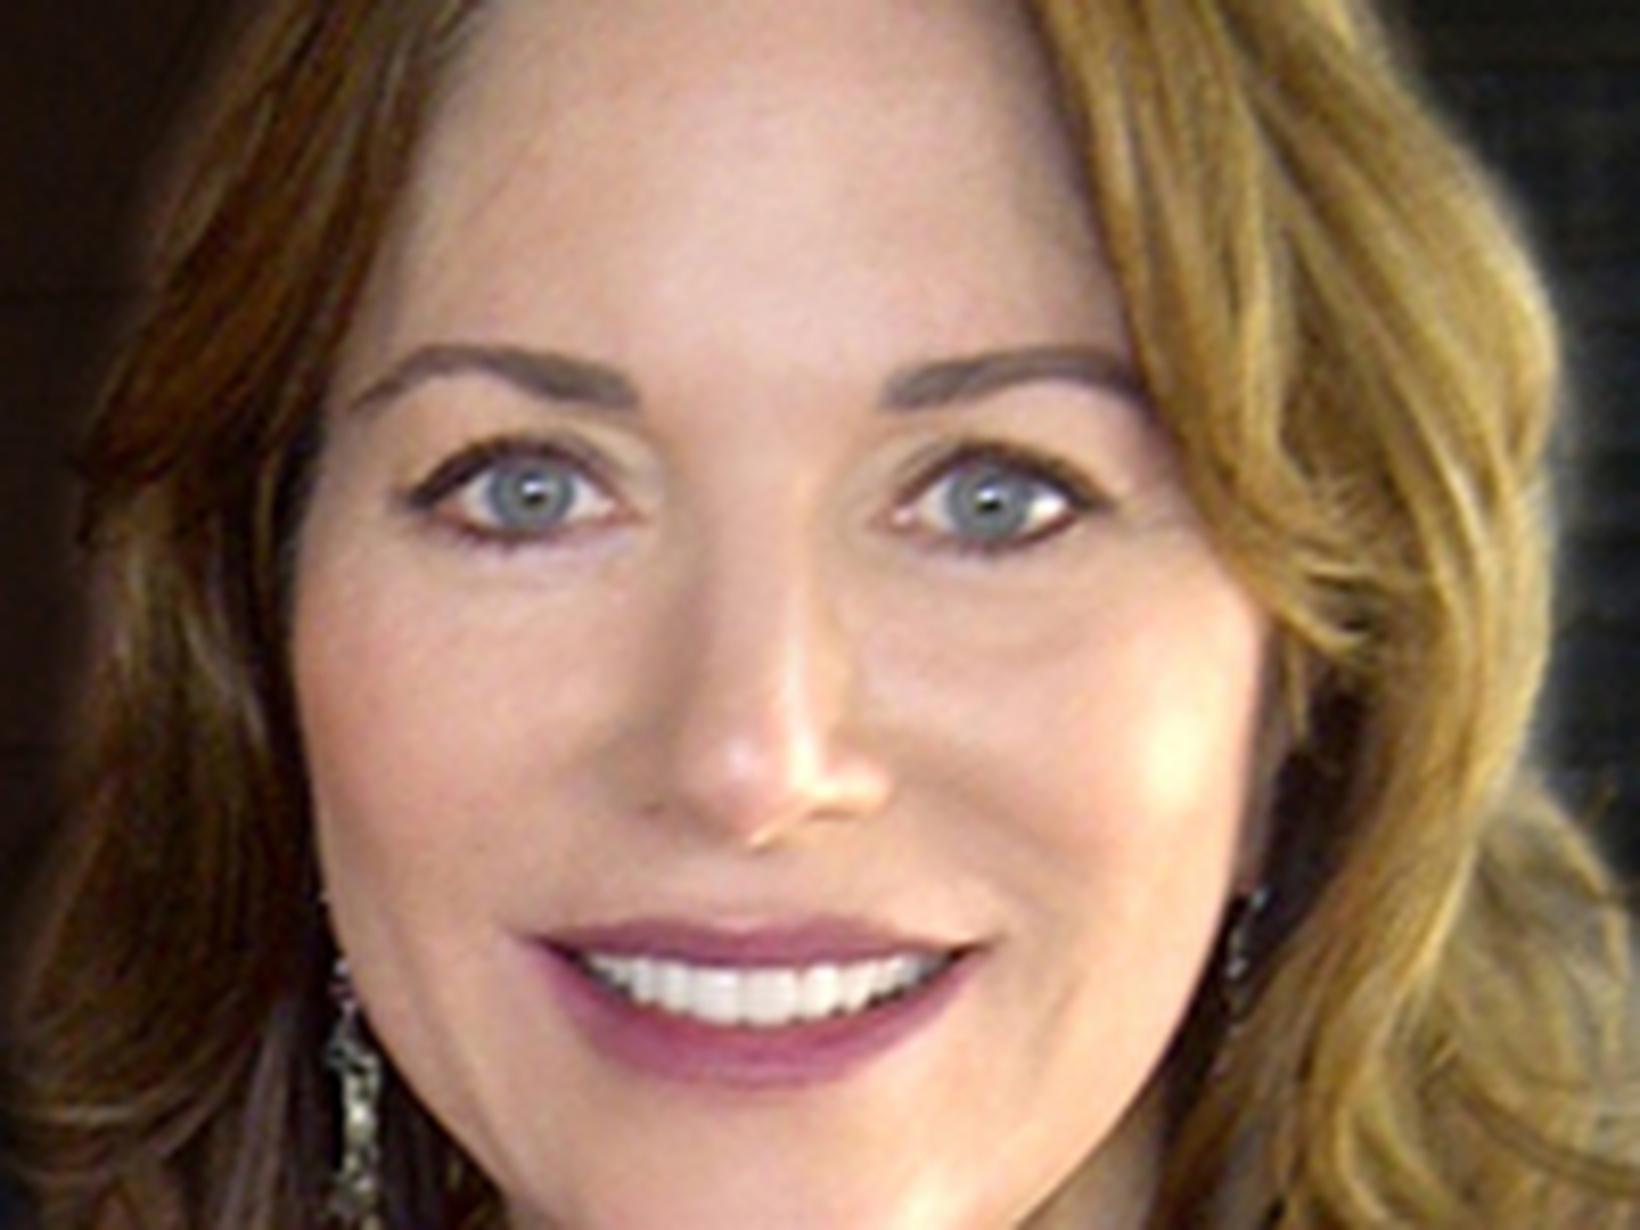 Debora from Jacksonville, Florida, United States